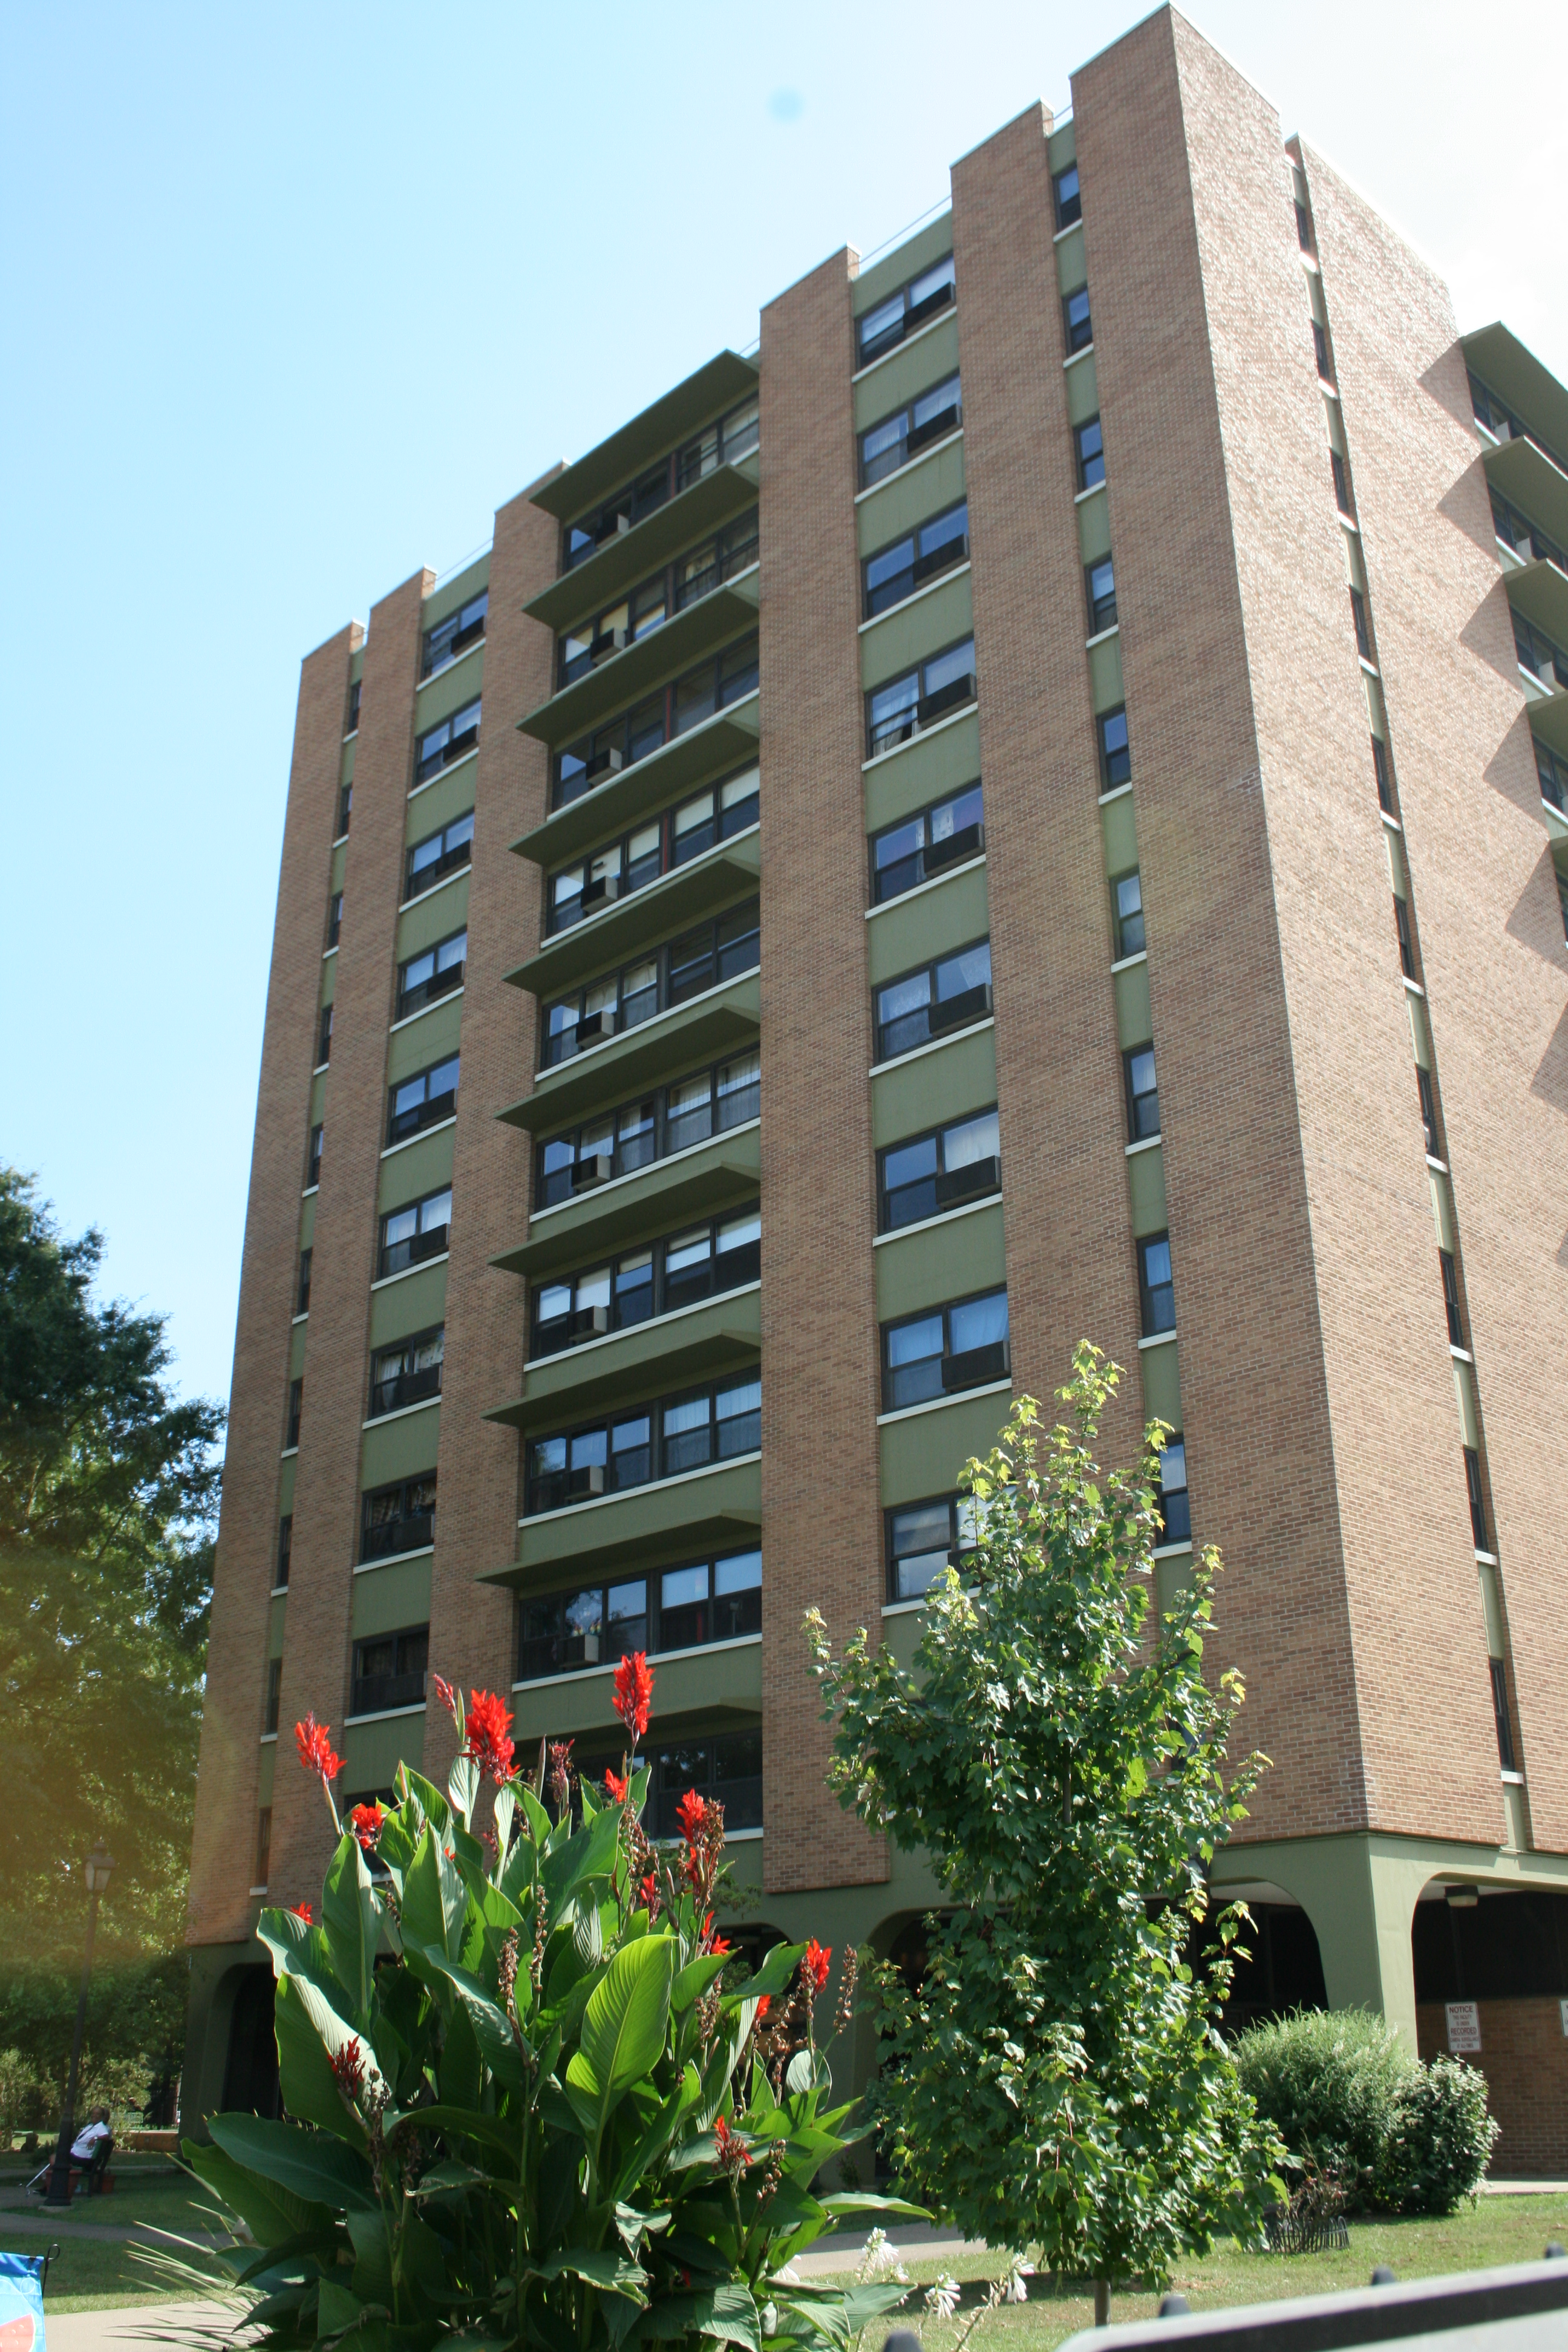 Charleston-Kanawha Housing Authority - Public Housing